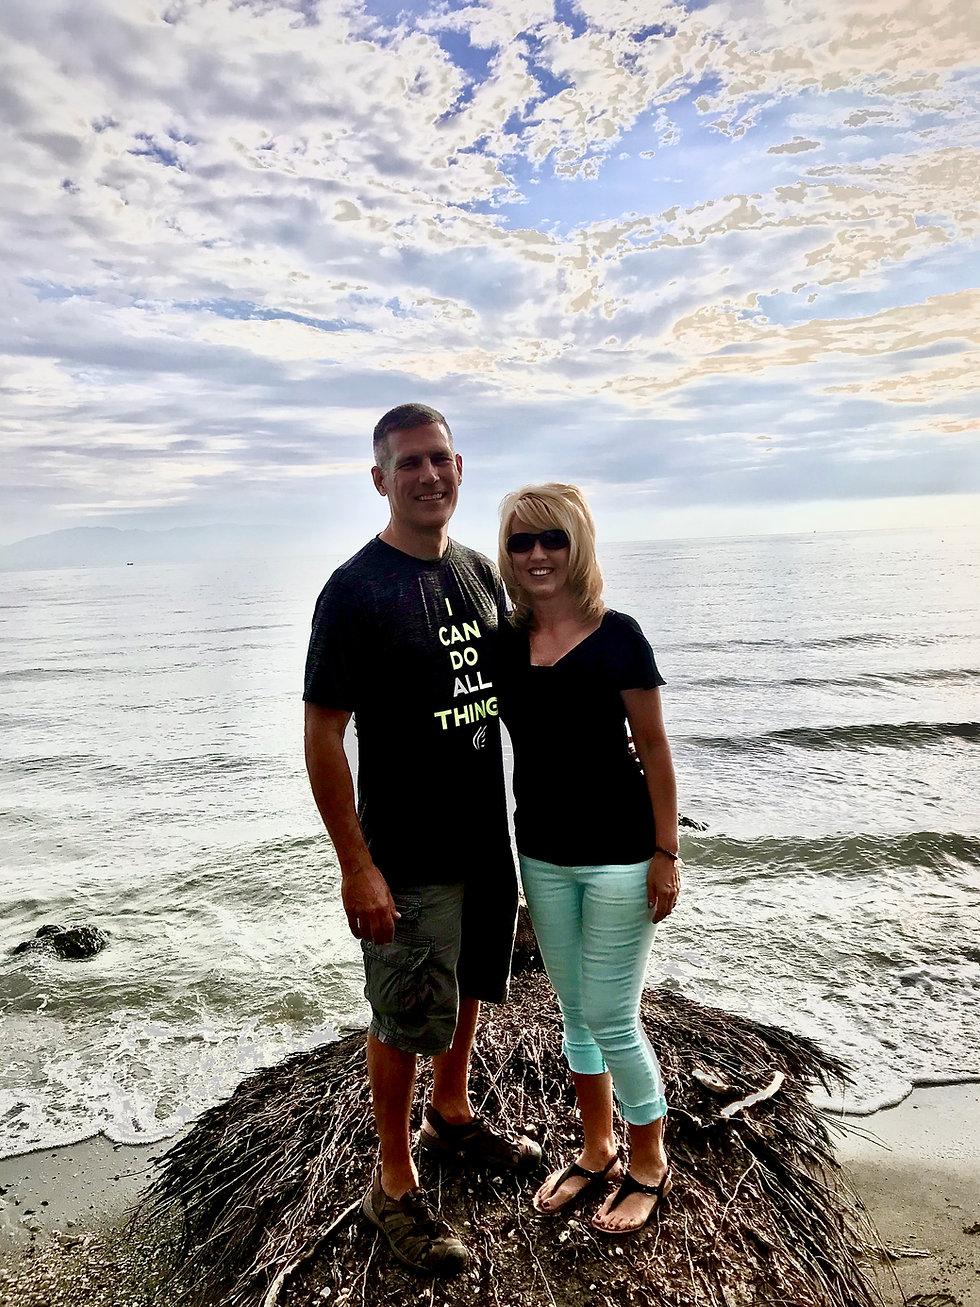 Tom and Yvette on beach 2.jpg